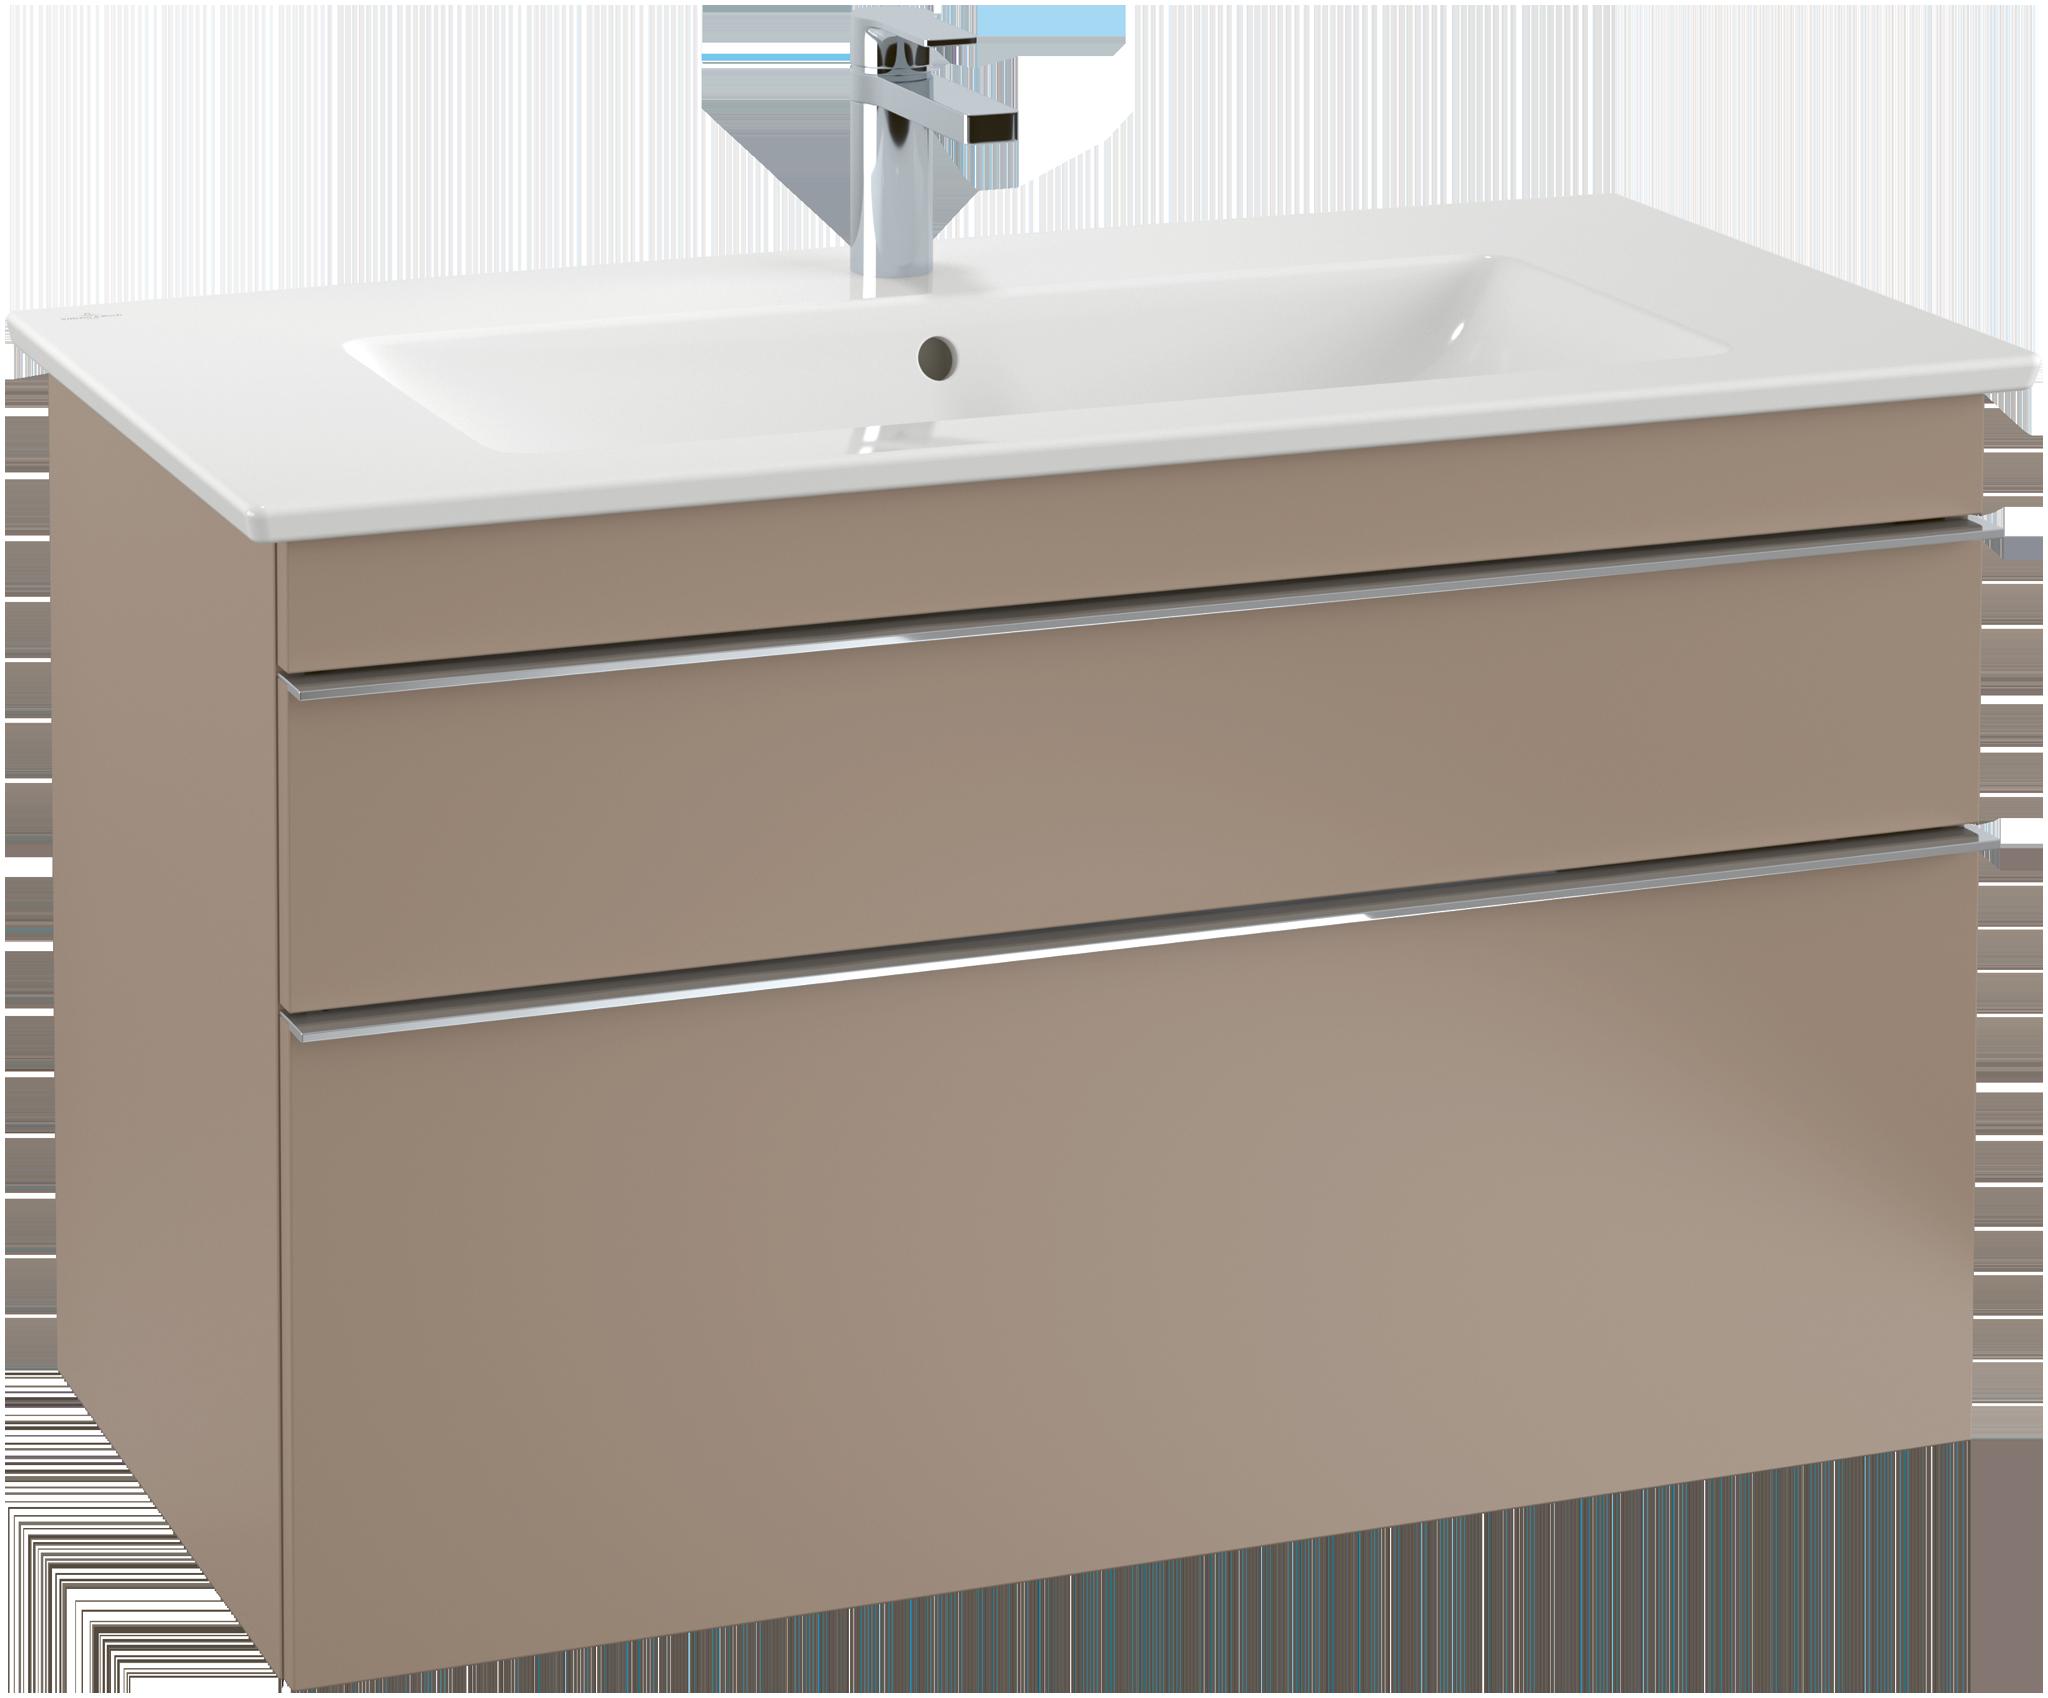 Venticello meuble sous lavabo a92504 villeroy boch for Meuble sous lavabo fly